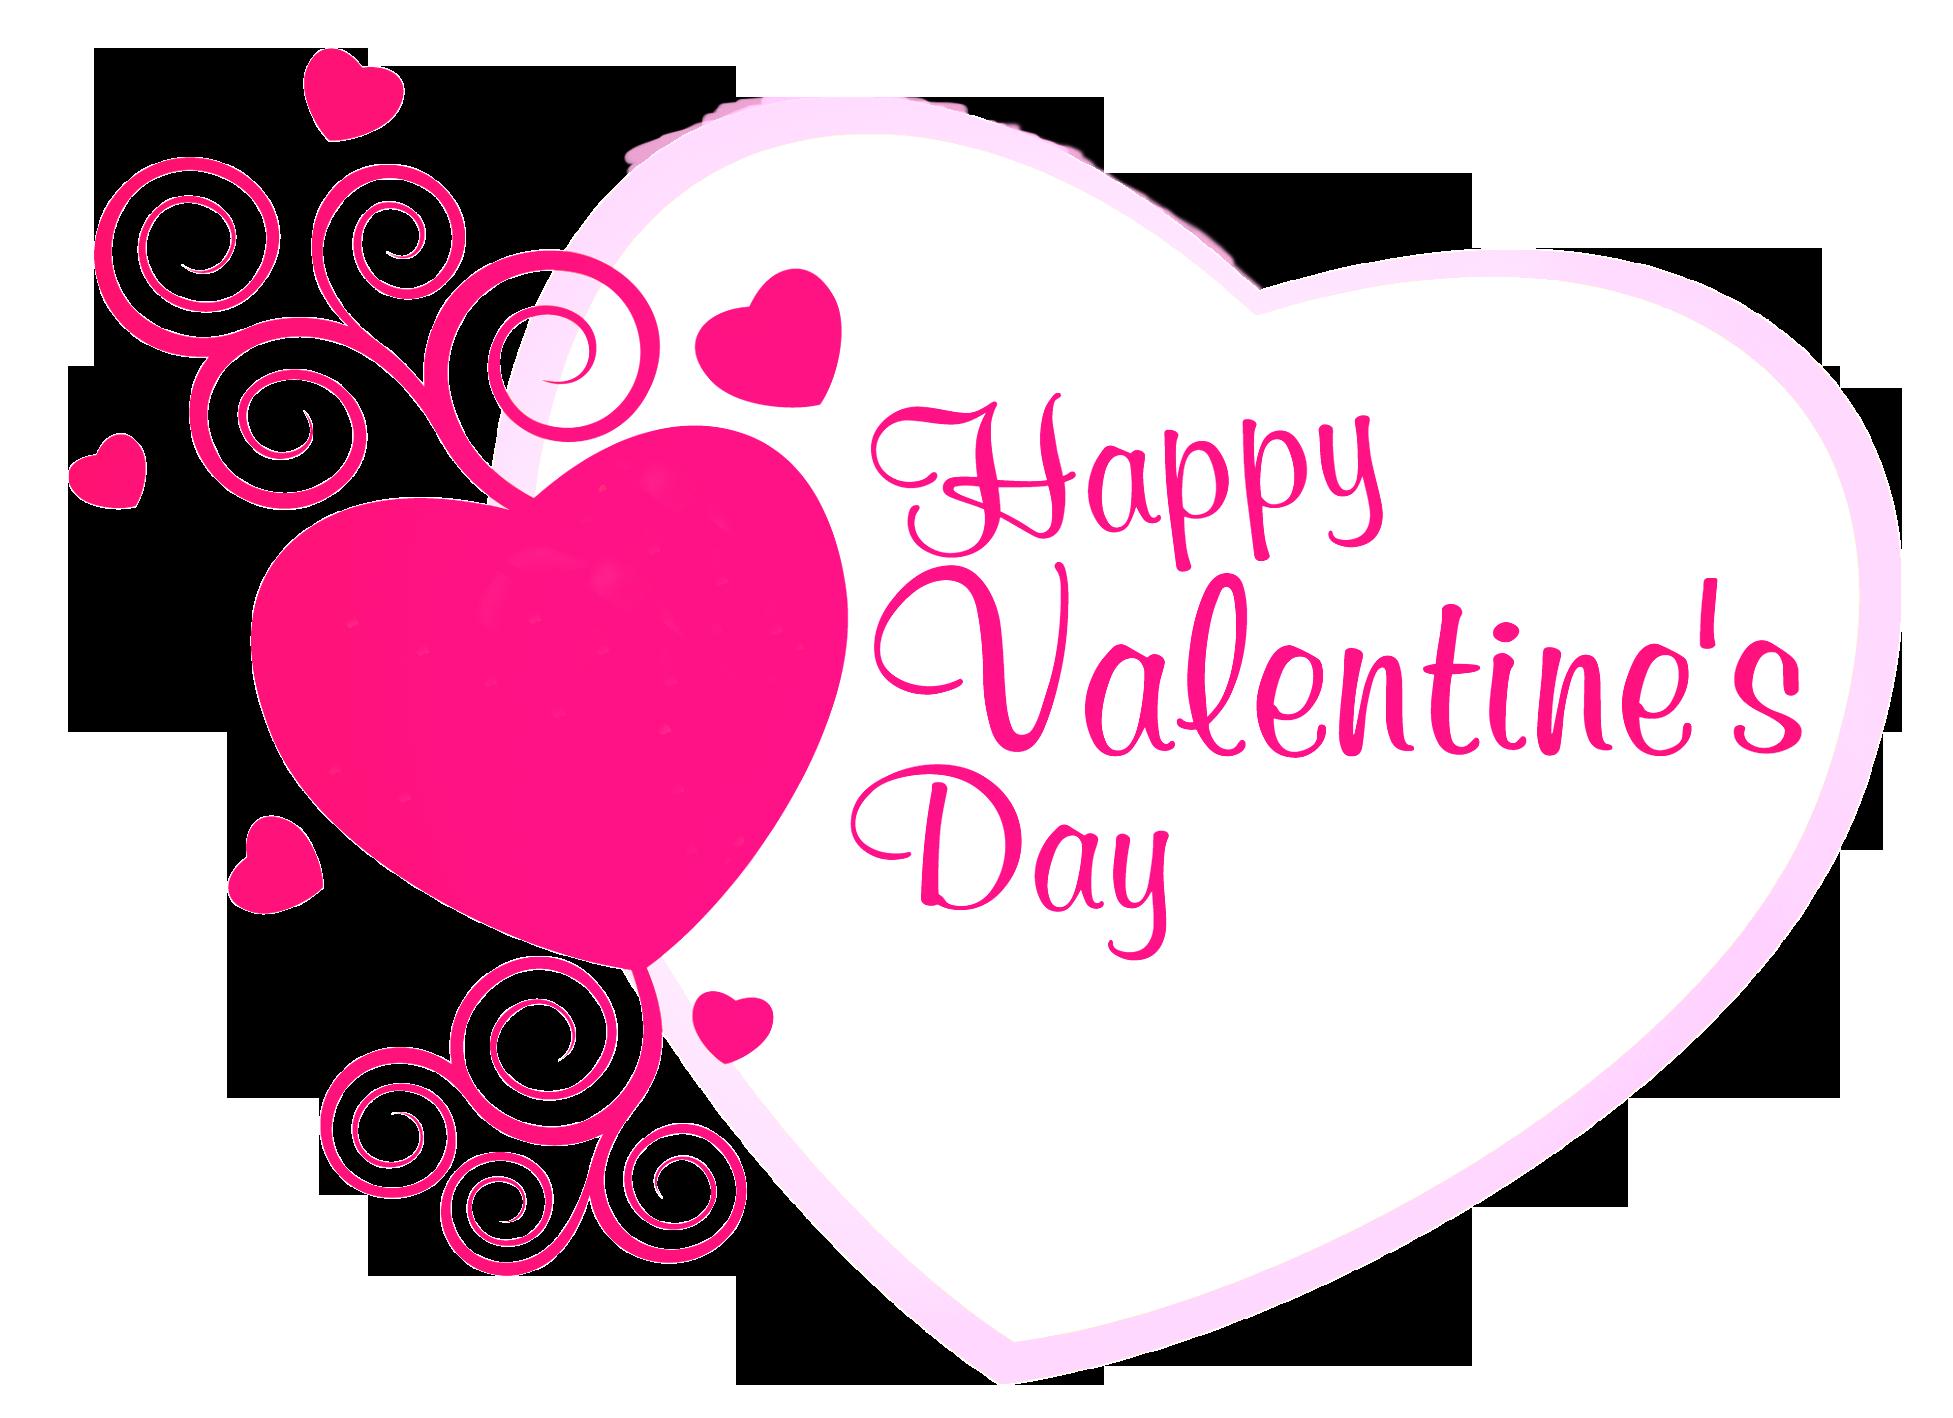 Valentines day clip art free happy valentine image 2.